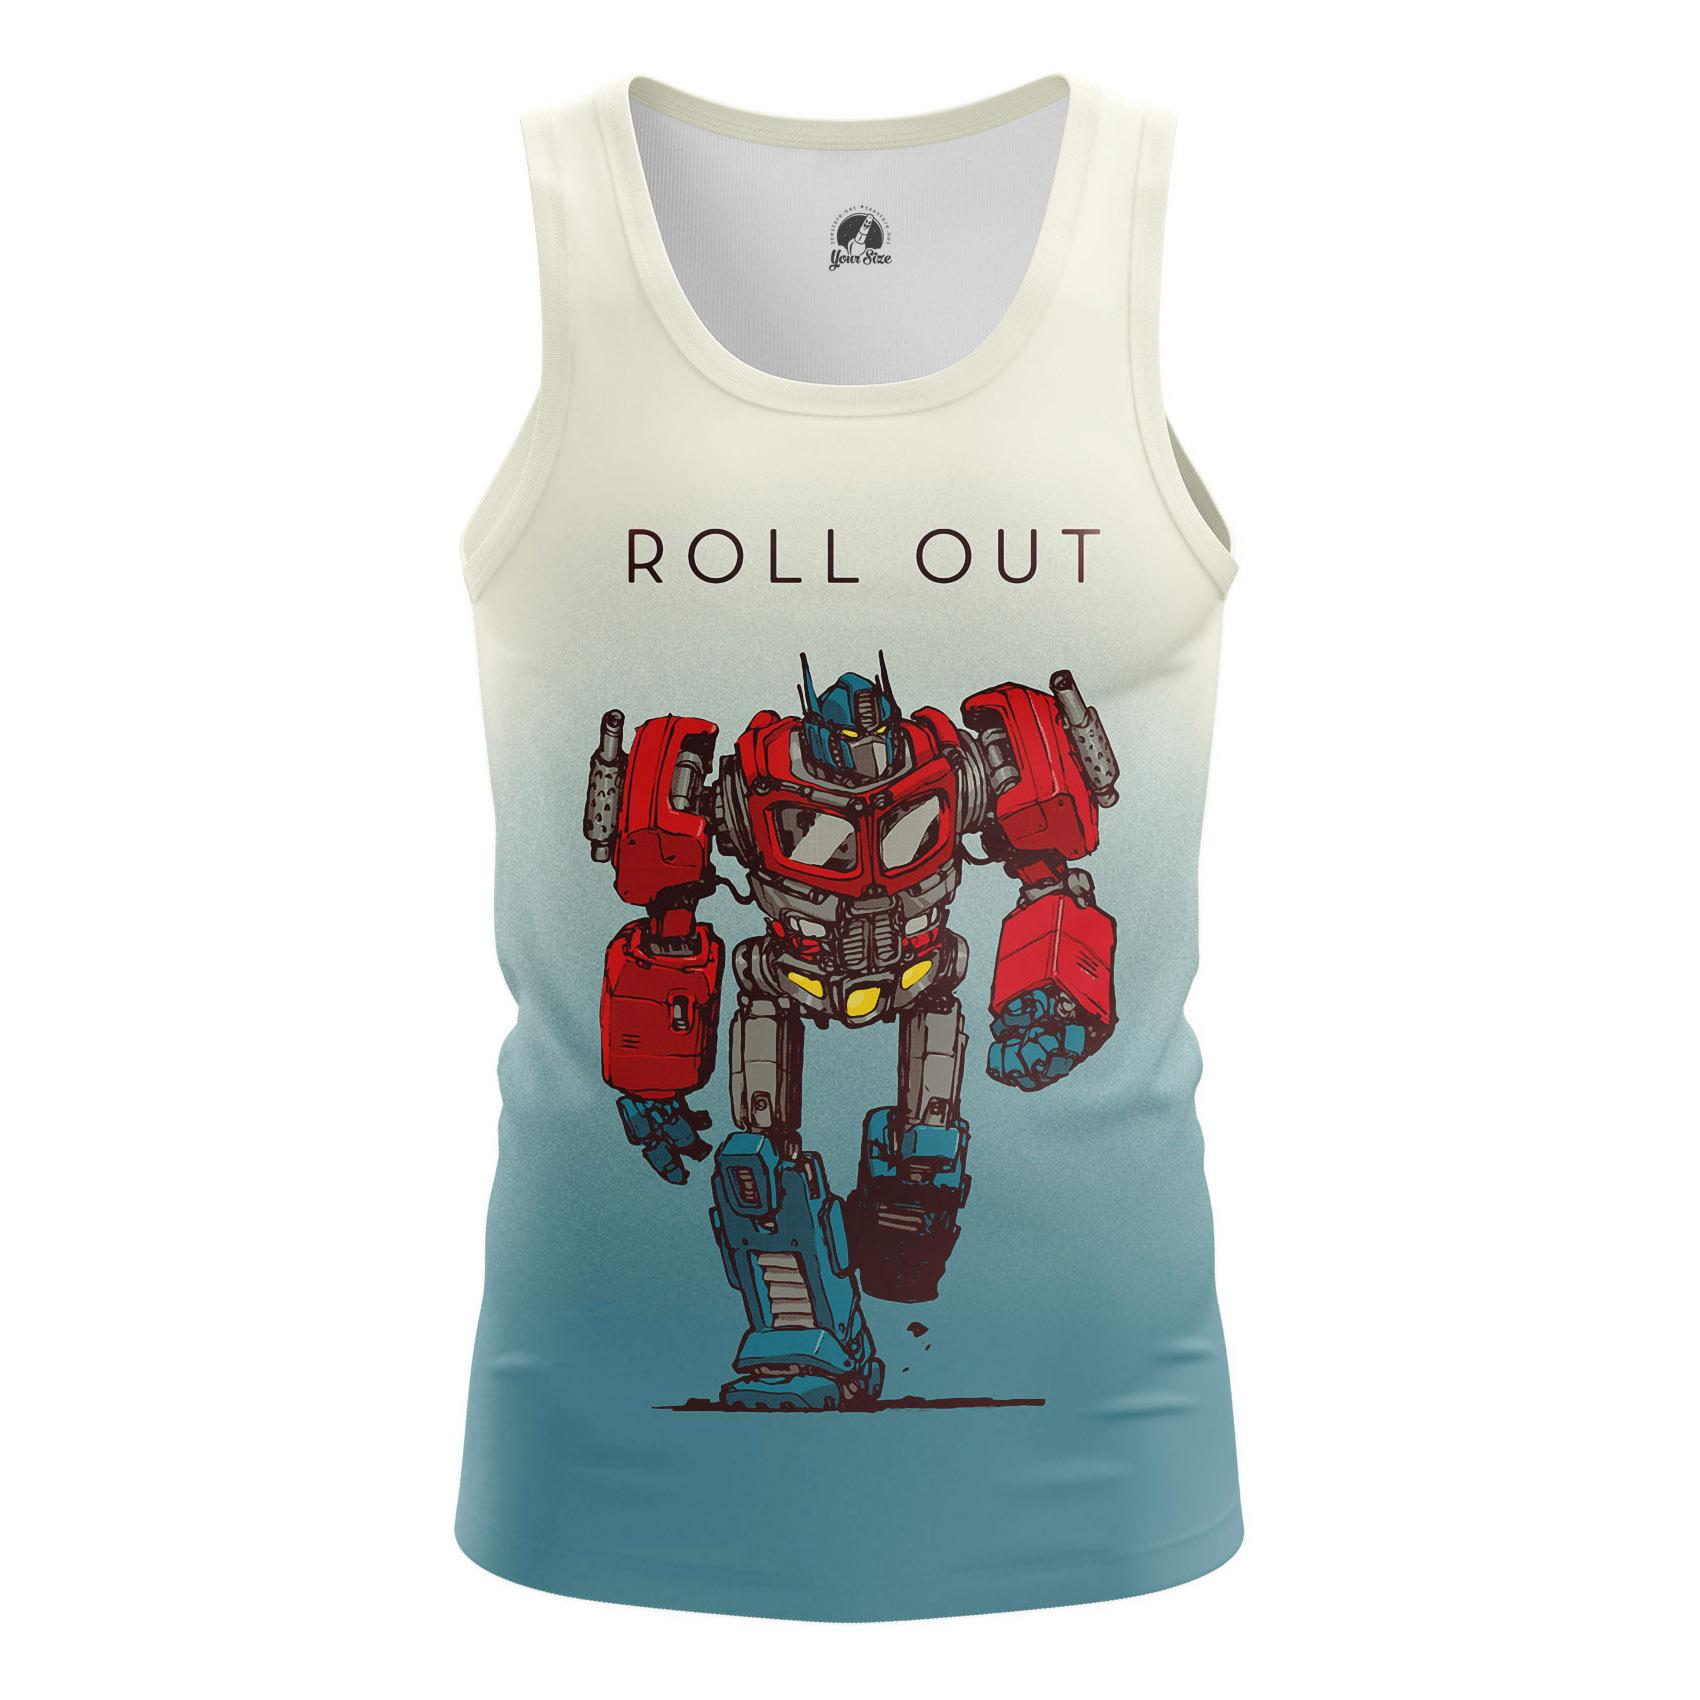 M-Tan-Rollout_1482275414_521